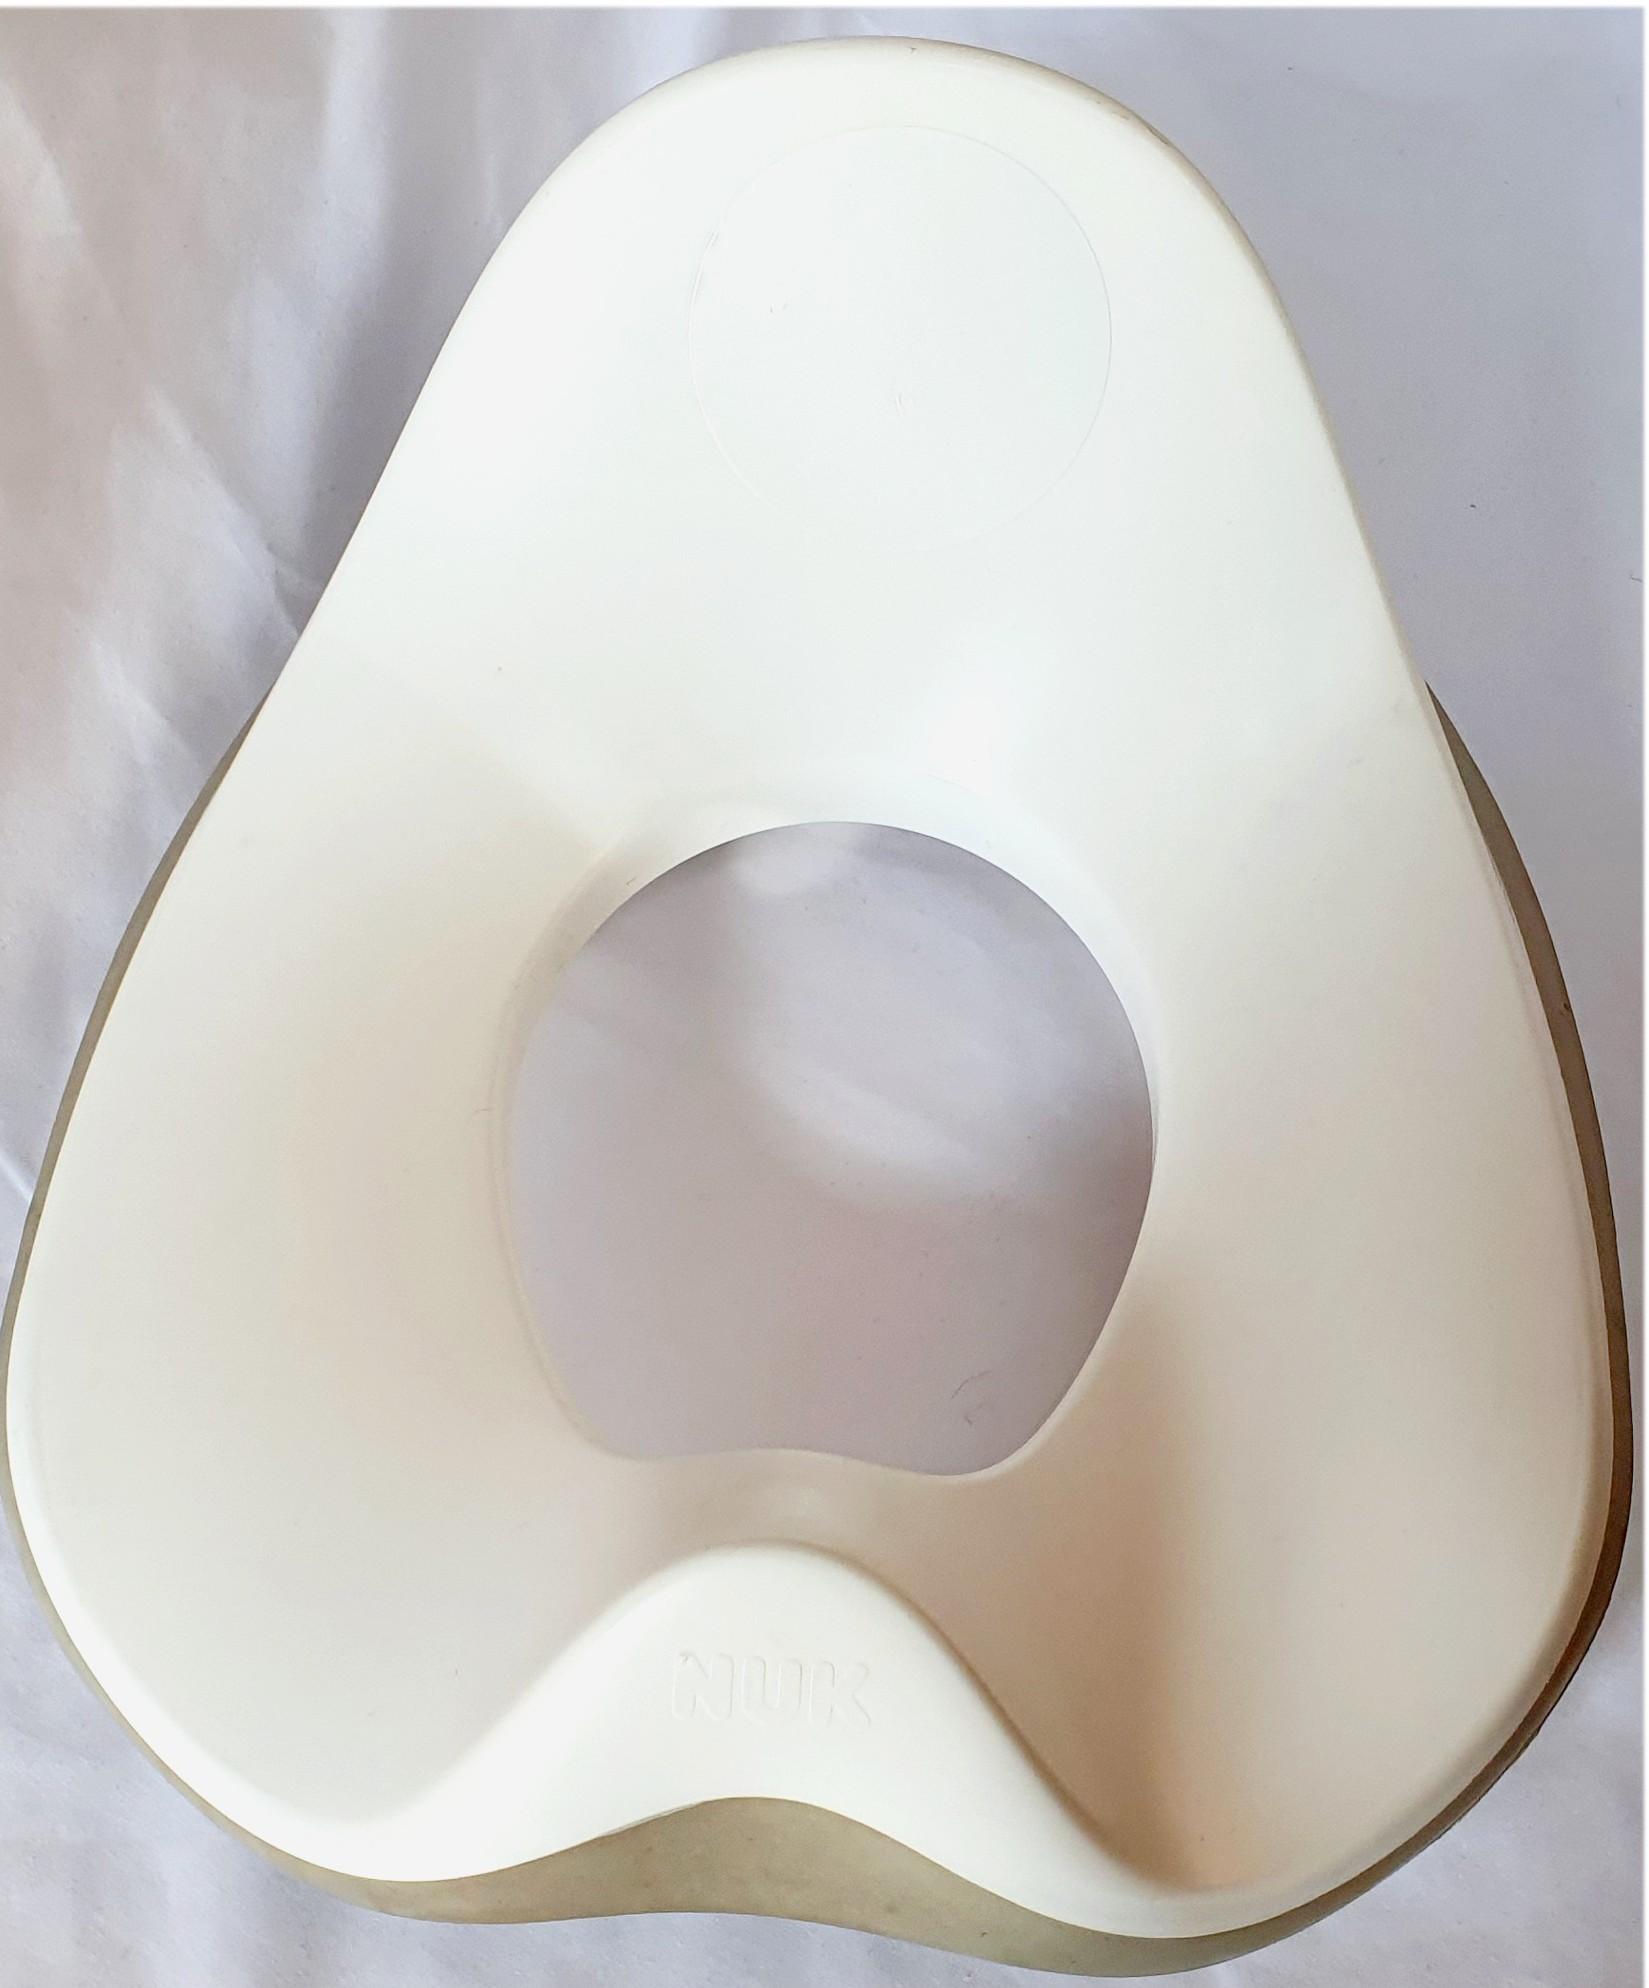 Riduttore - NUK - Riduttore Universale WC